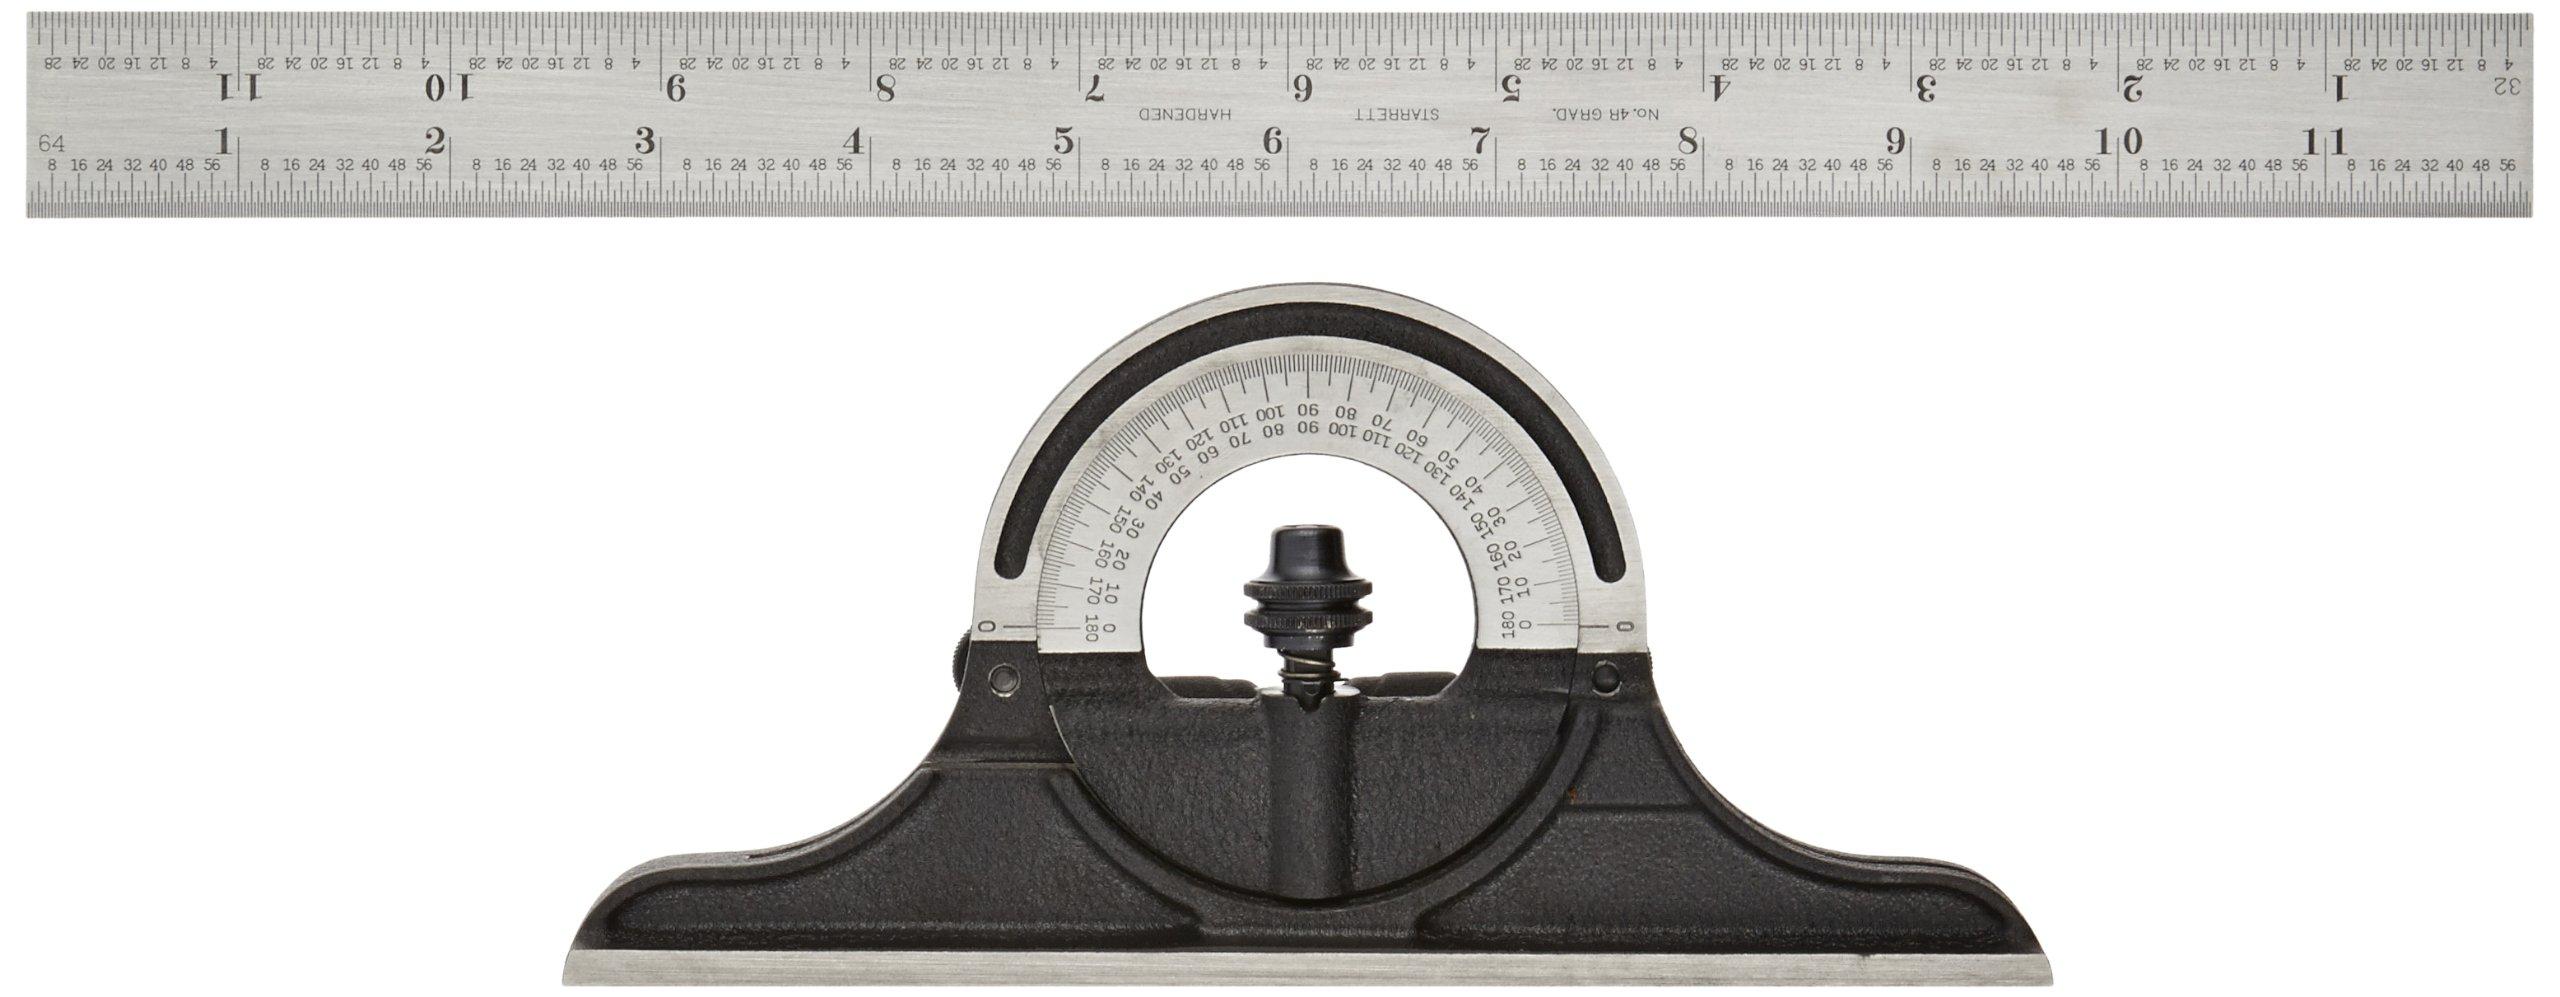 Starrett 491-12-4R Bevel Protractor, Protractor Head, Reversible, Black Wrinkle Finish,12'', 4R Grad